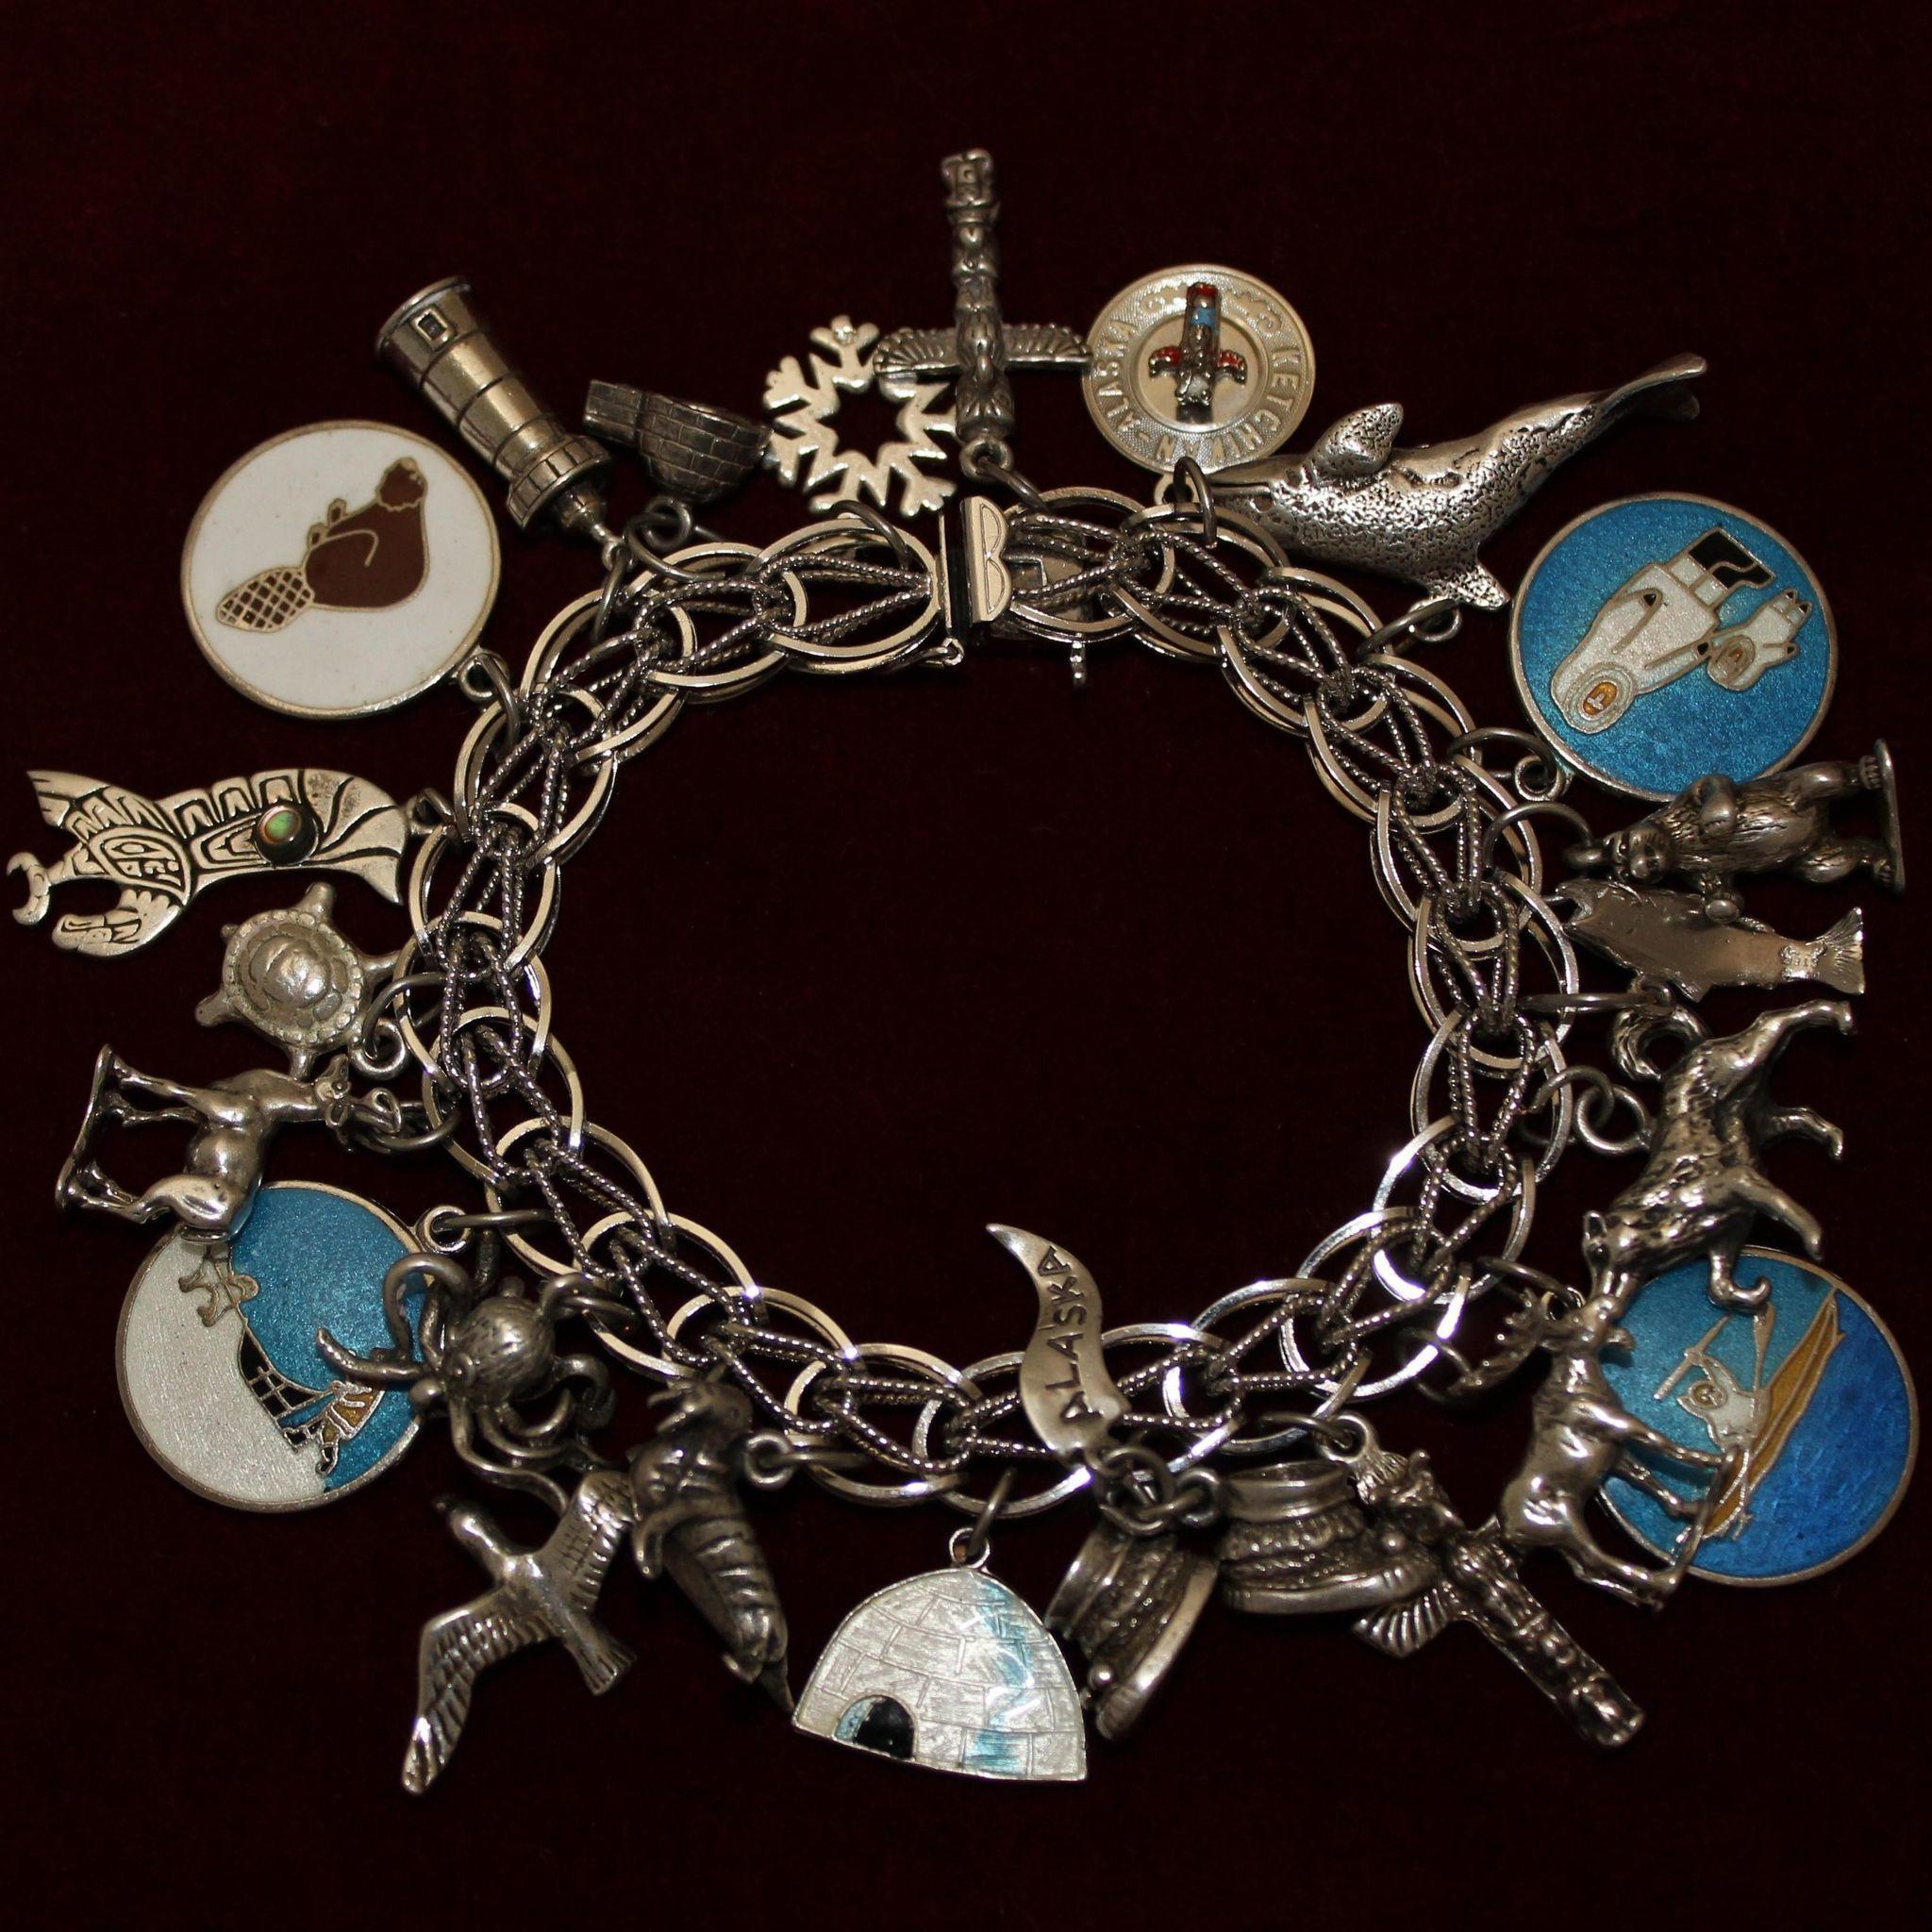 Sterling Alaska Charm Bracelet With 23 Alaskan Theme Vintage